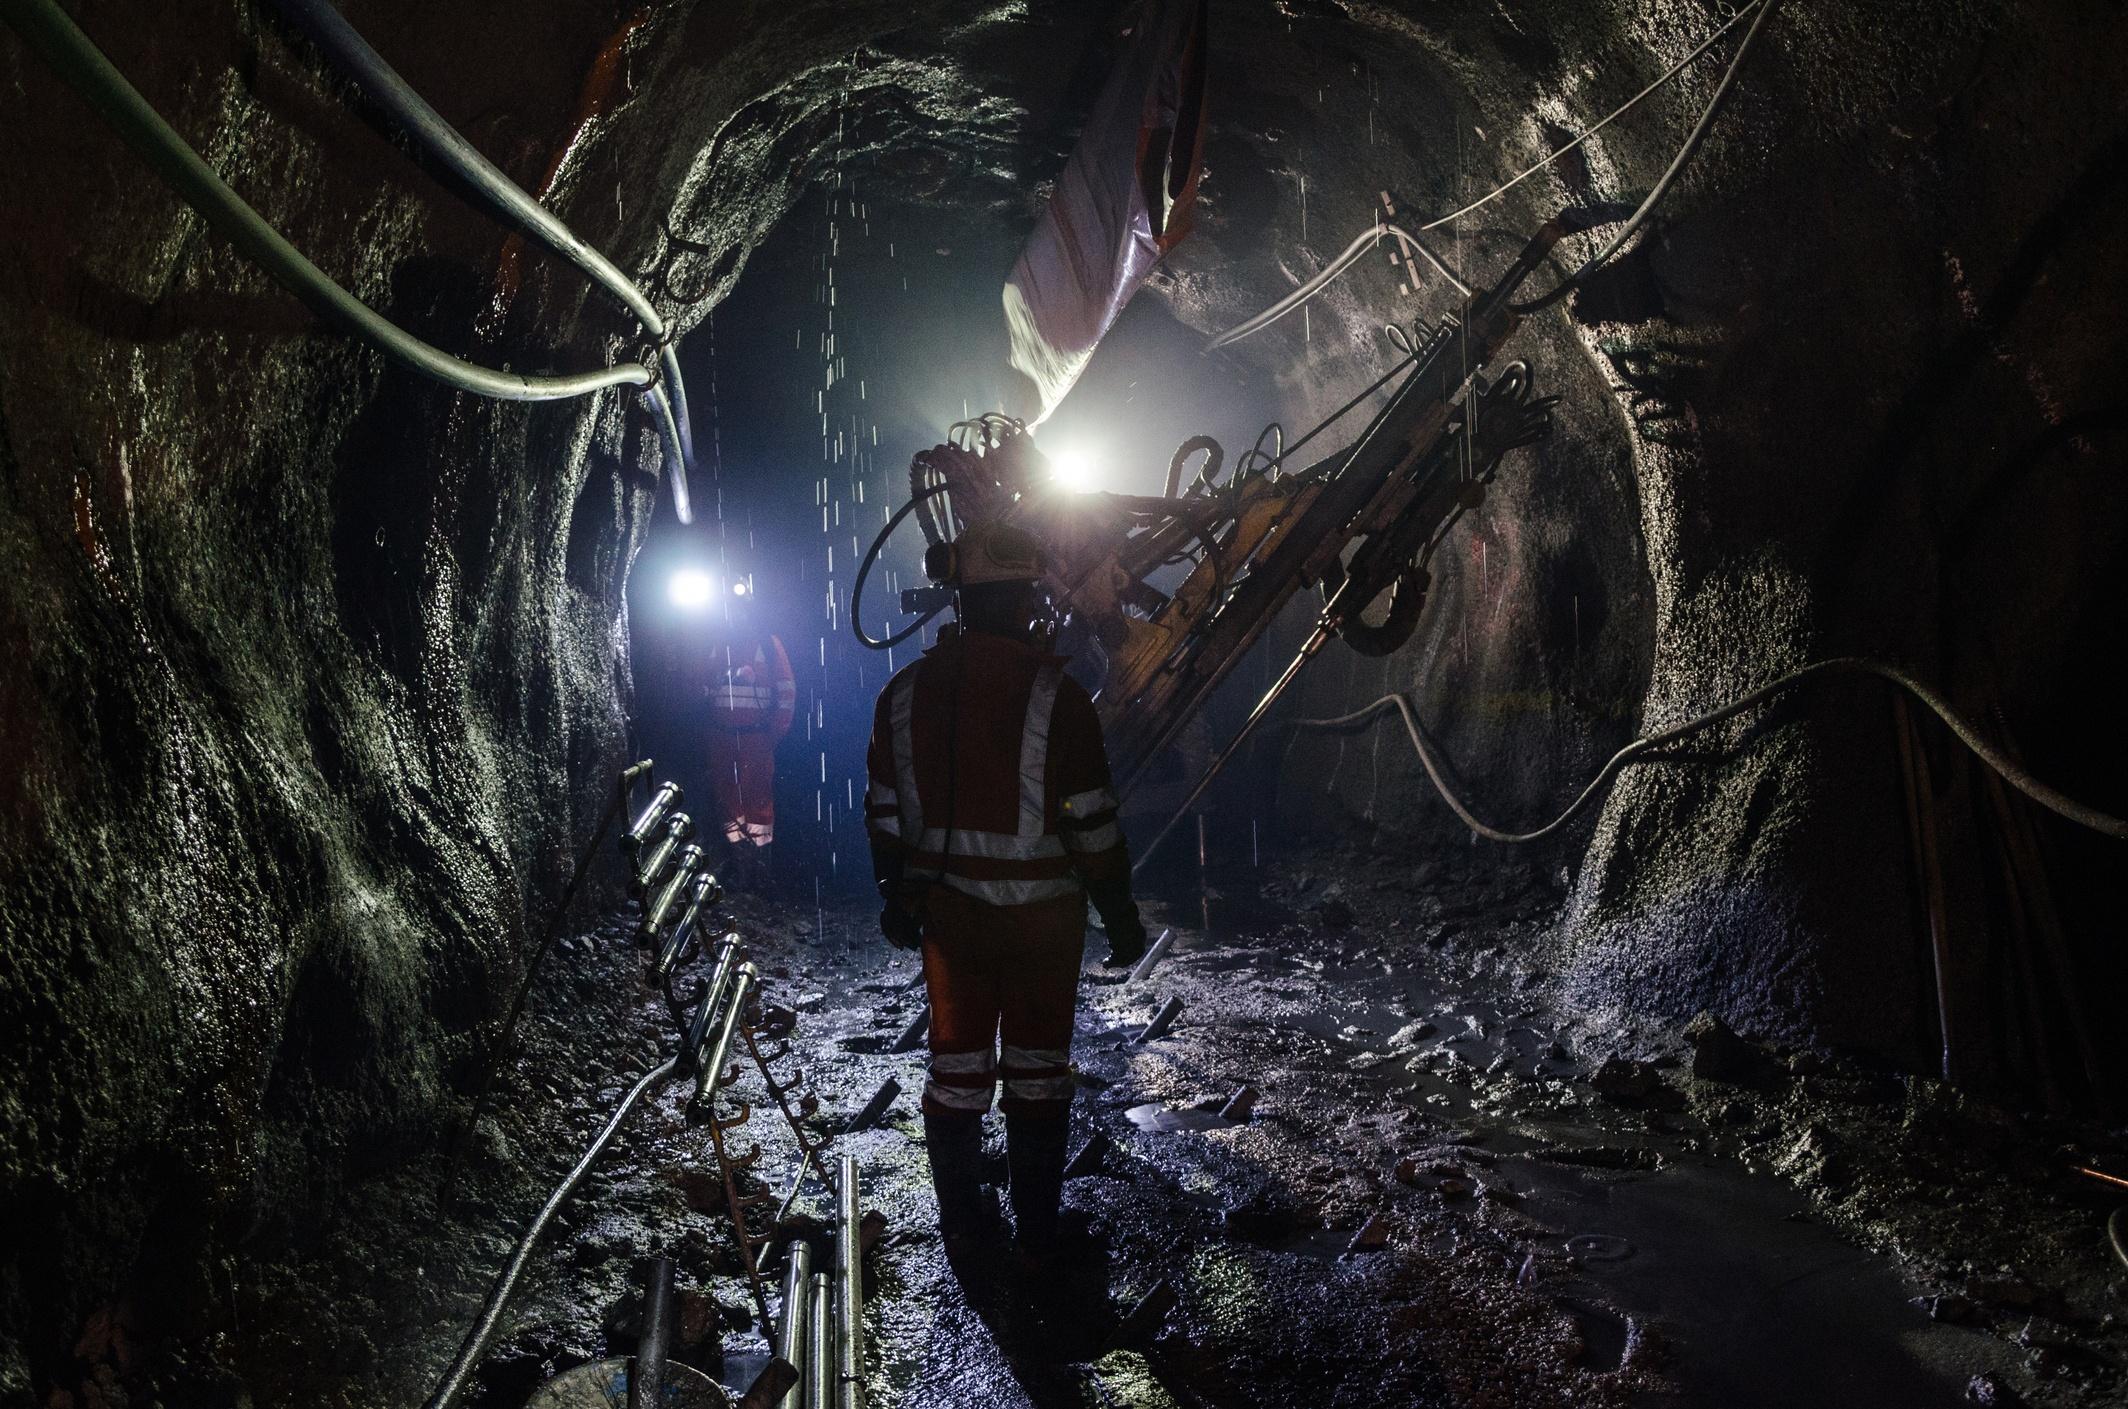 dark mine.jpg